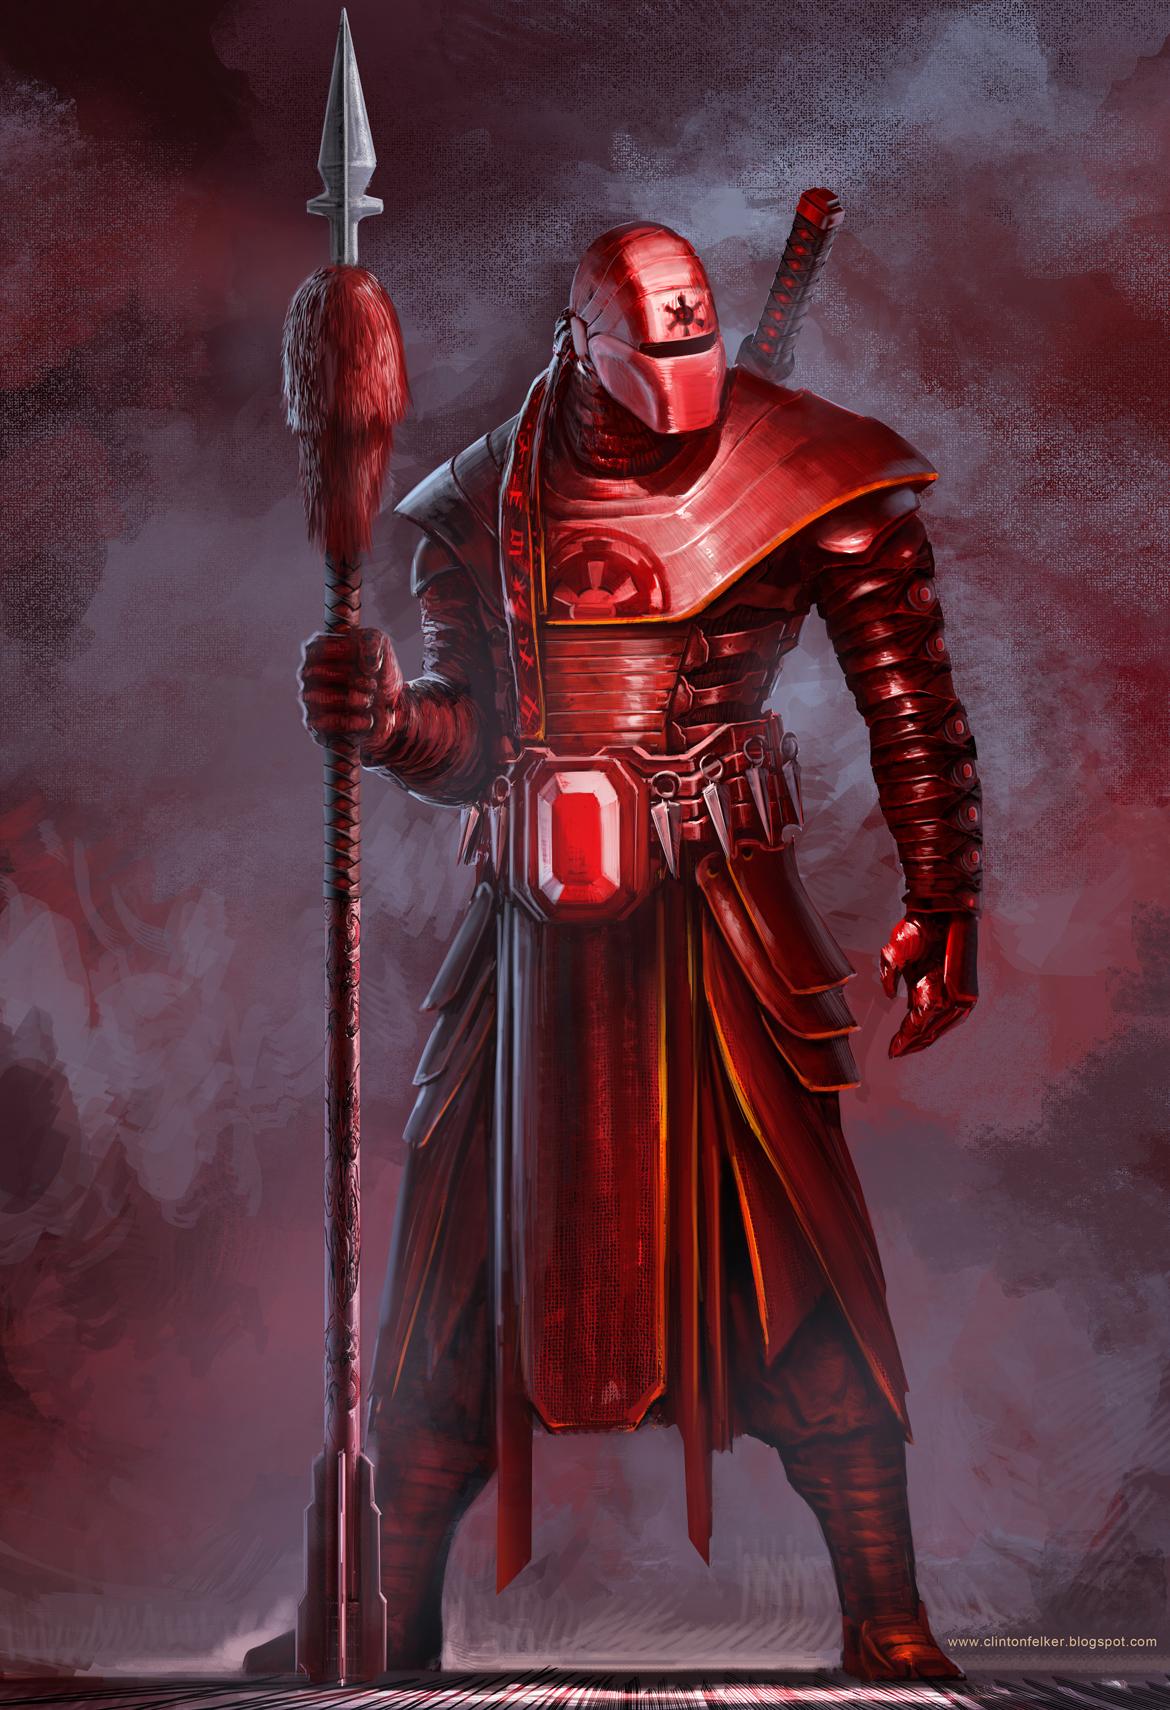 Samurai Imperial Guard Concept by cgfelker 1170x1710